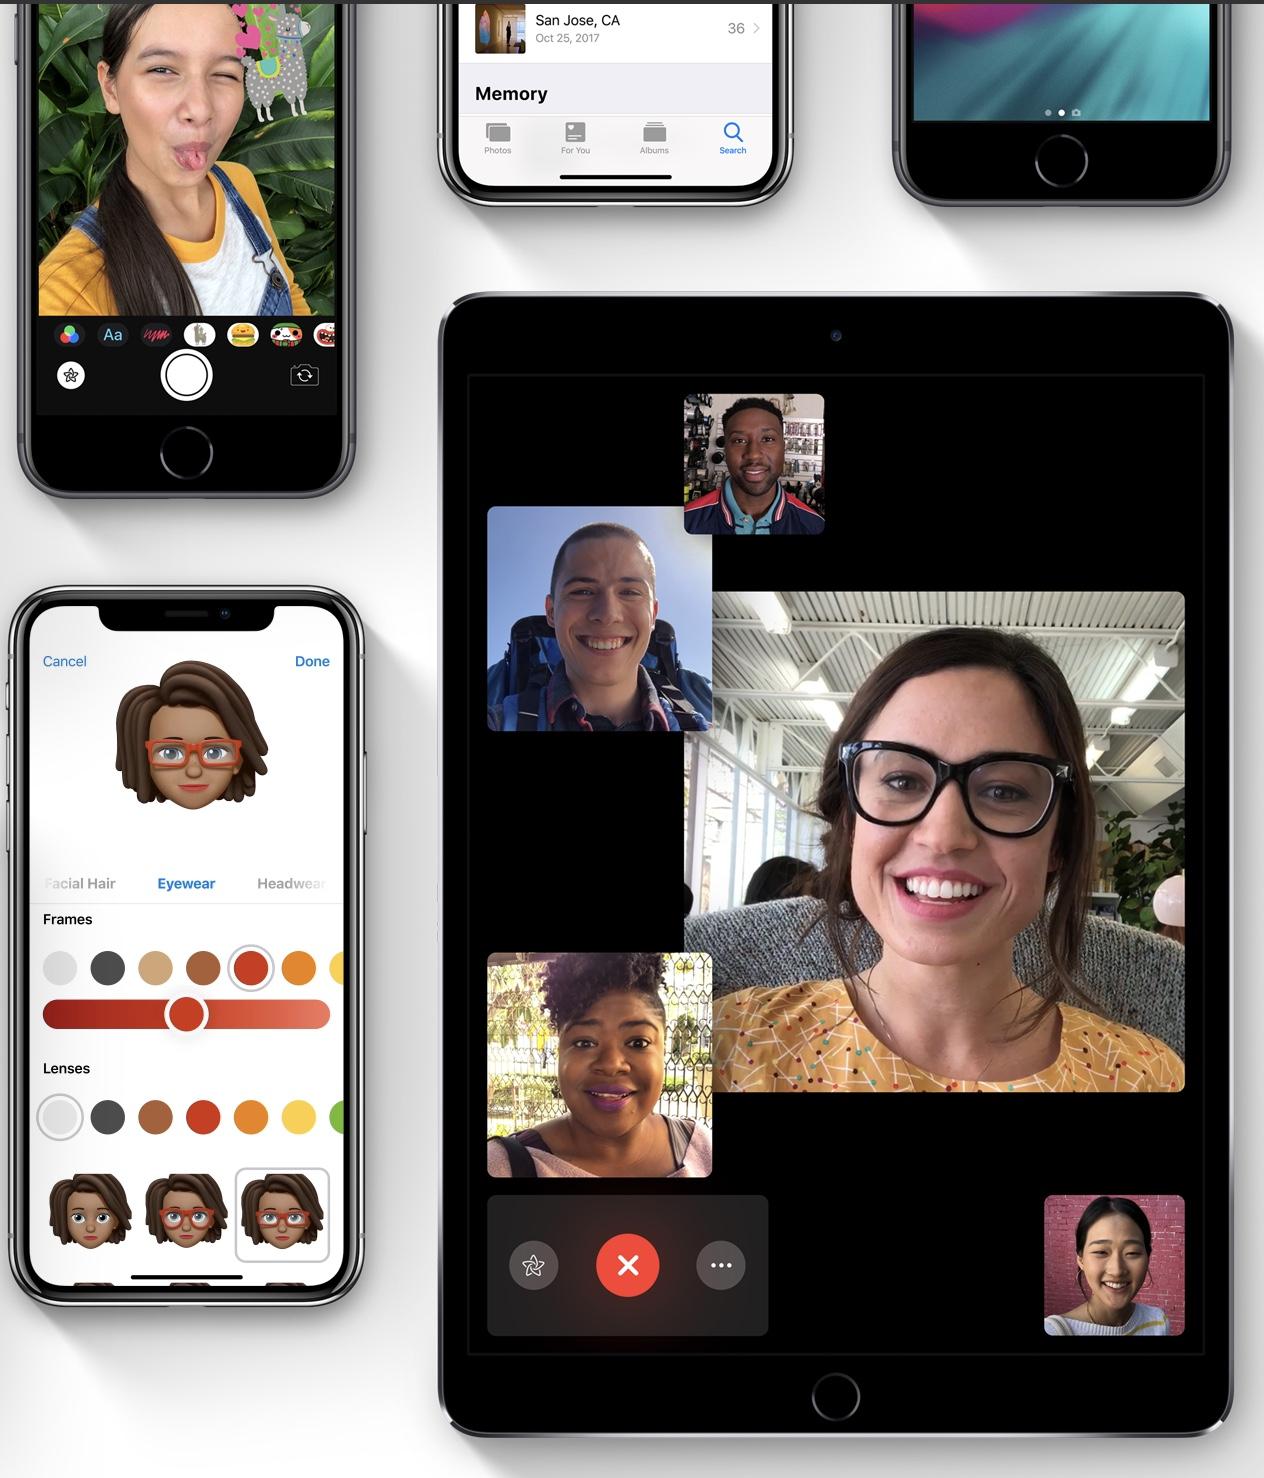 Apple releases iOS 12.2